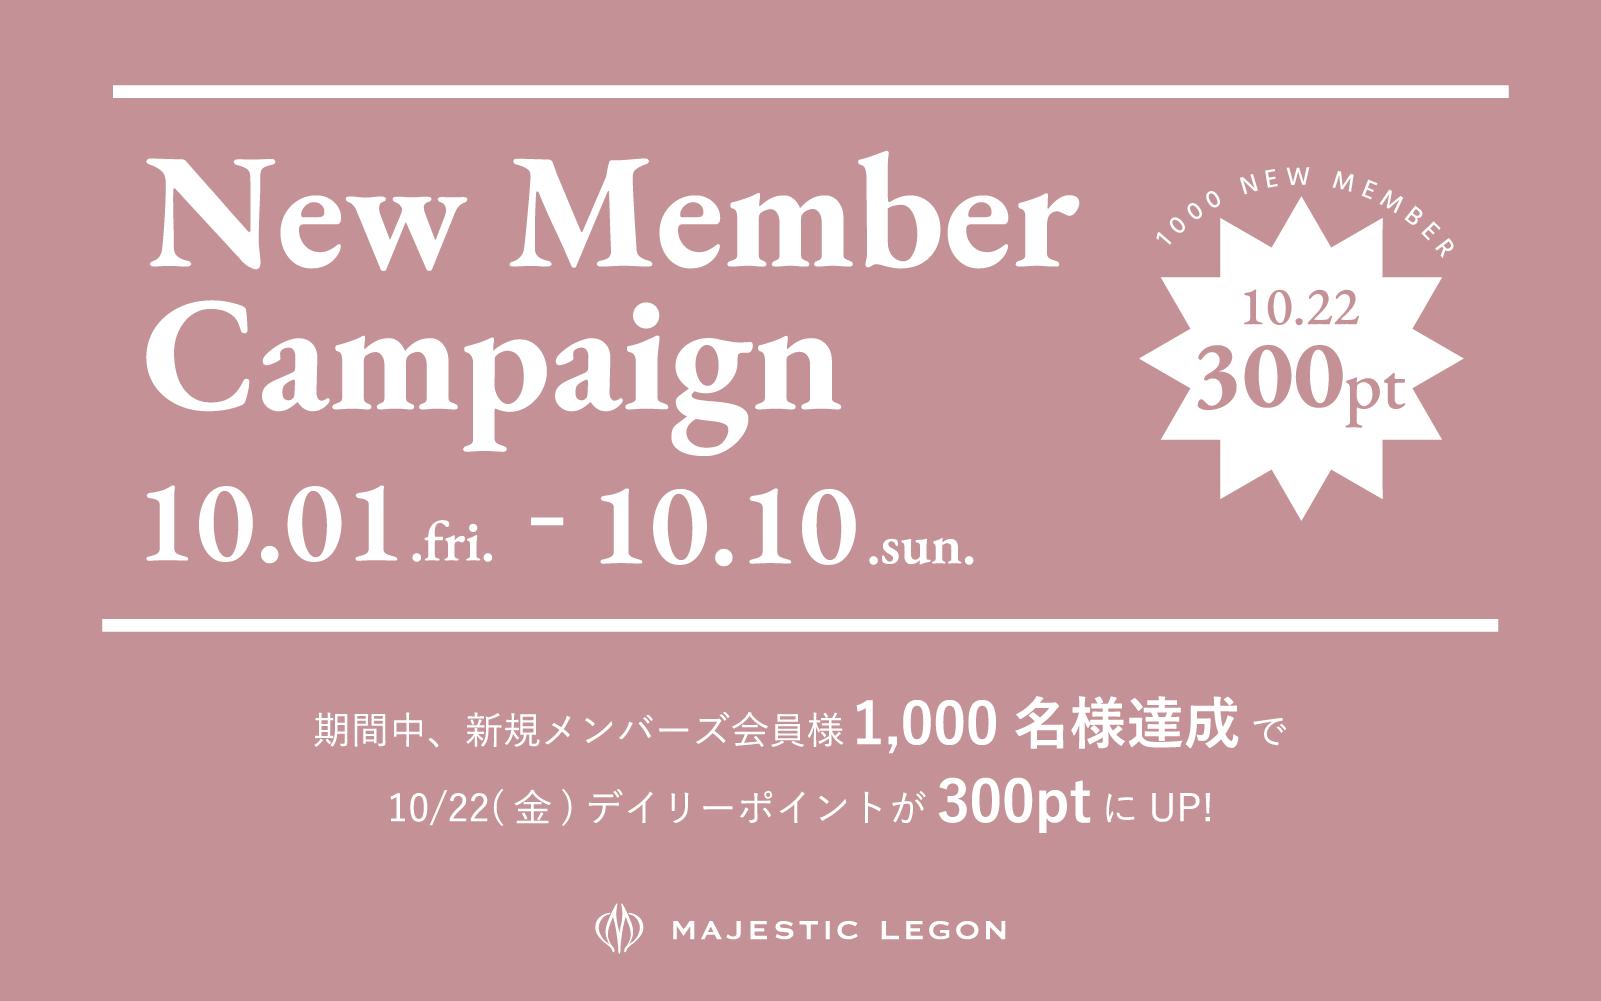 New Member Campaign! 10.01.fri.START